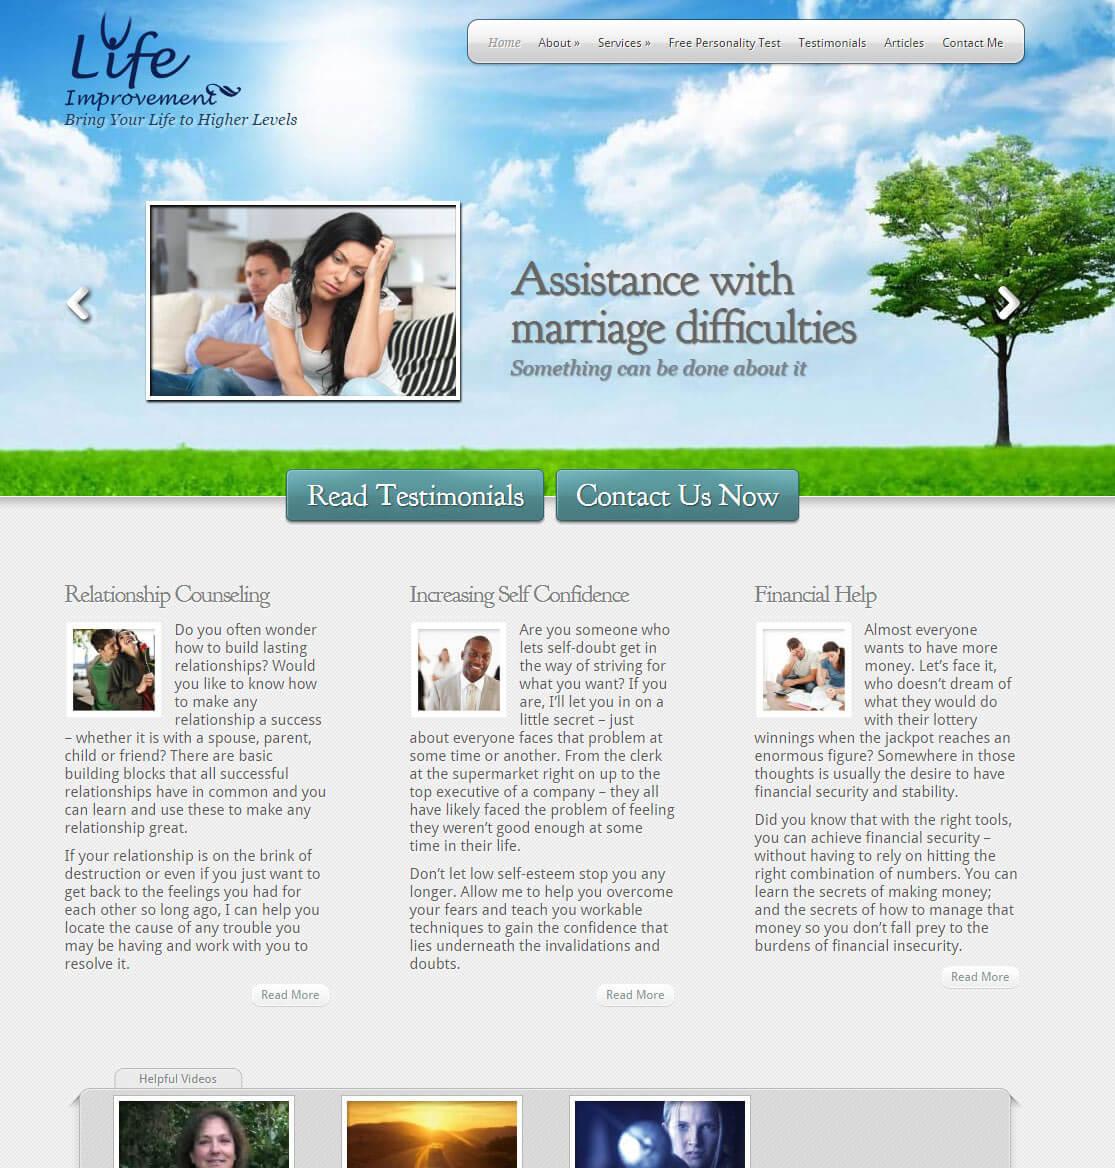 Self-Help website and testing